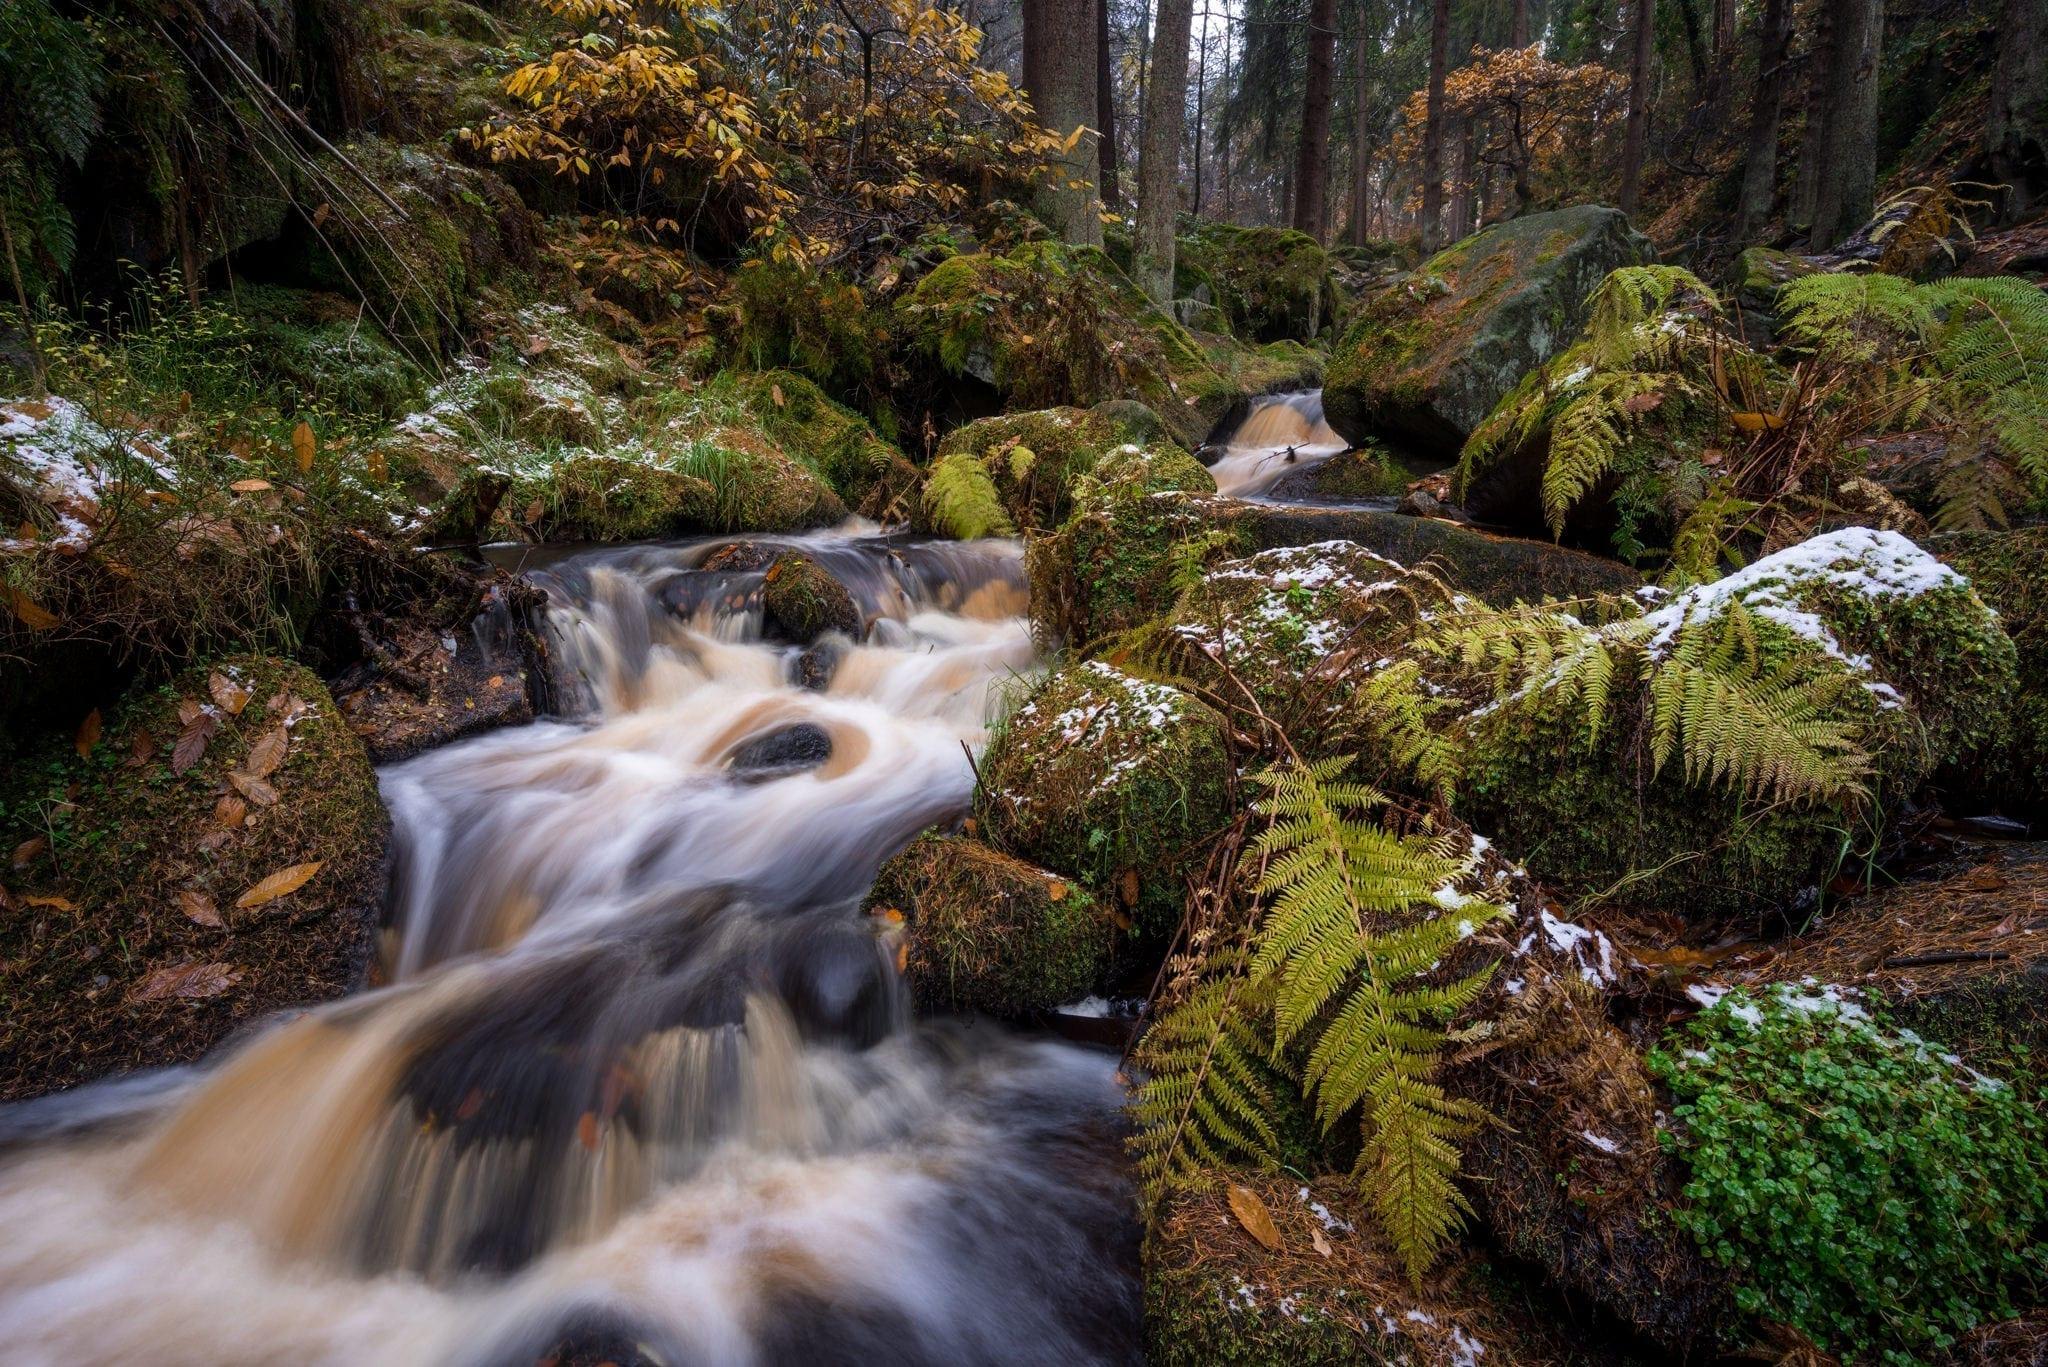 Wyming Brook Autumn Snow - Autumn in the Peak District Photography Workshop